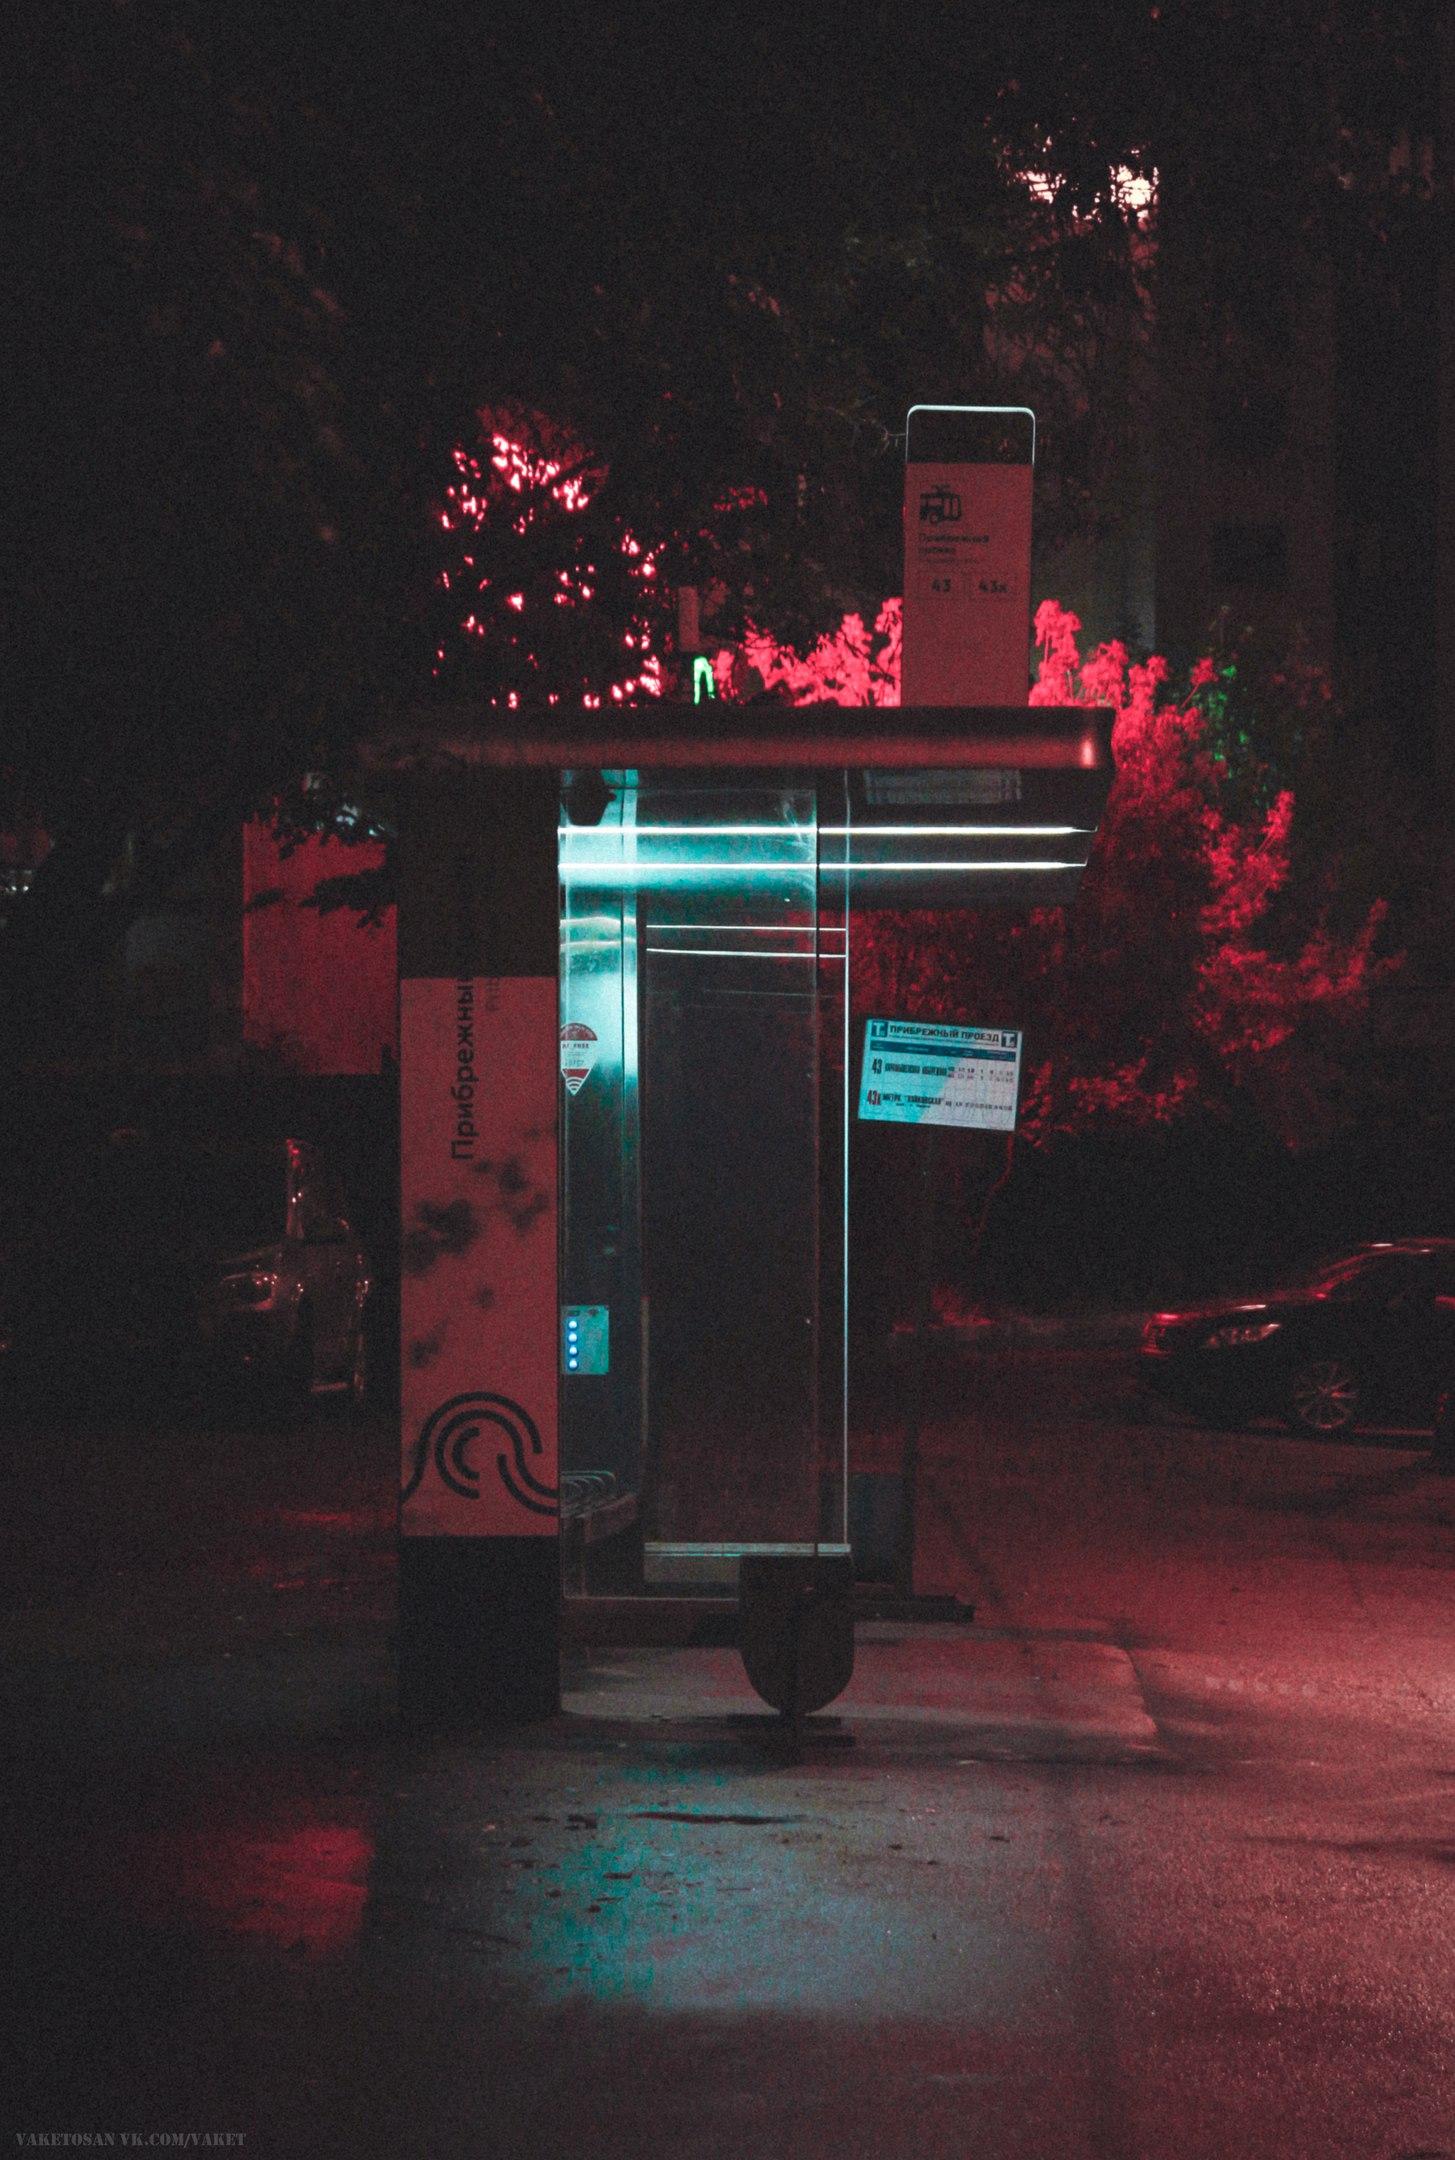 Bus Stop Cyberpunk